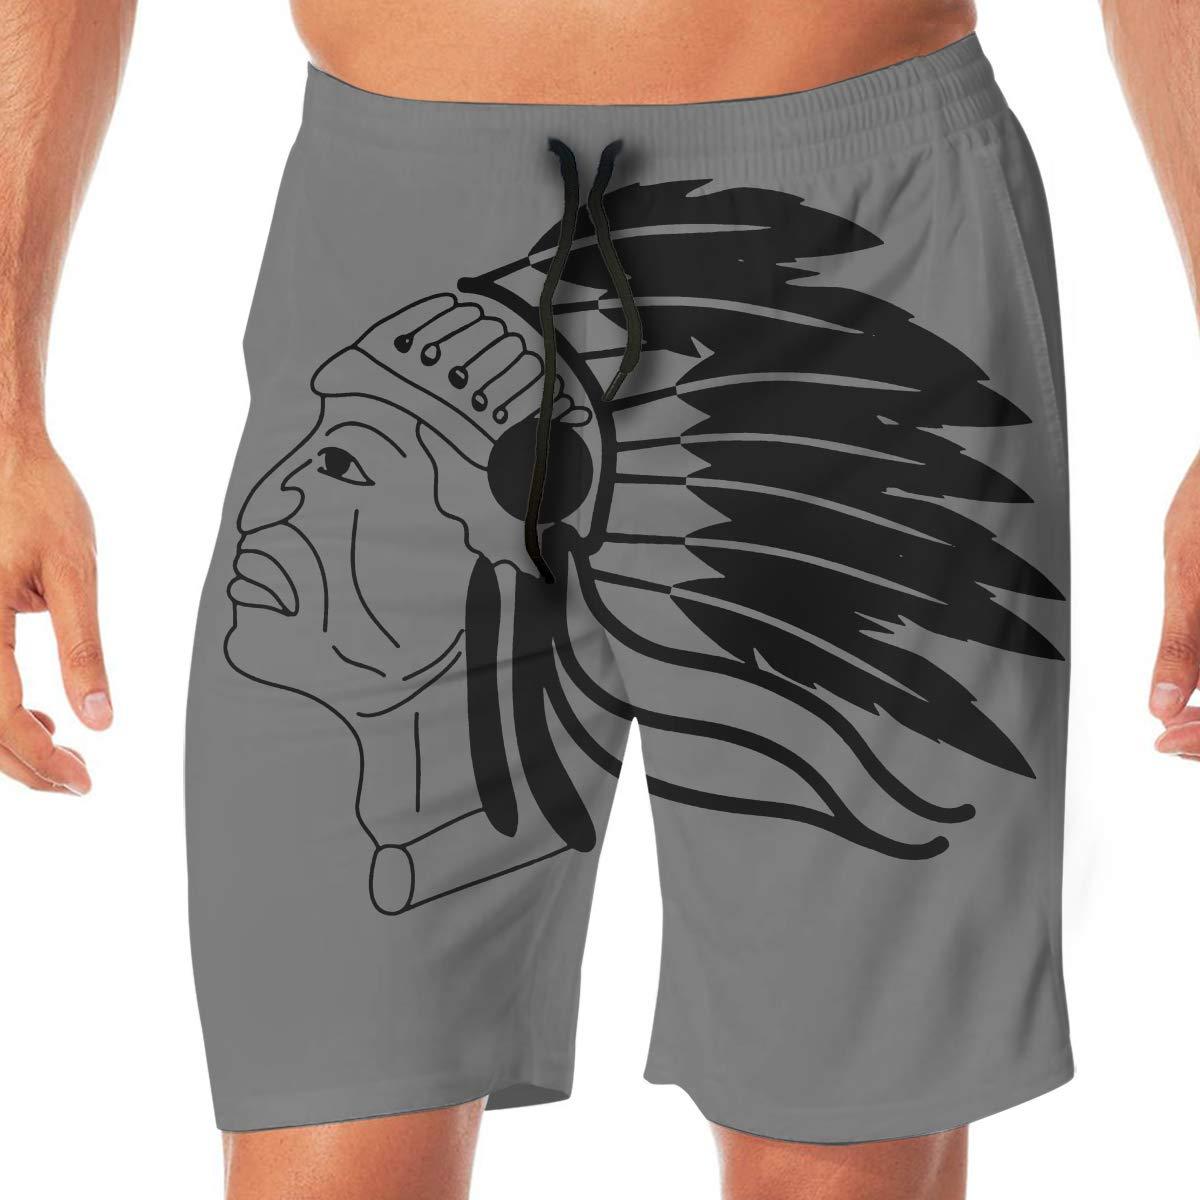 American Indian Mens Beach Shorts Casual Shorts Swim Trunks